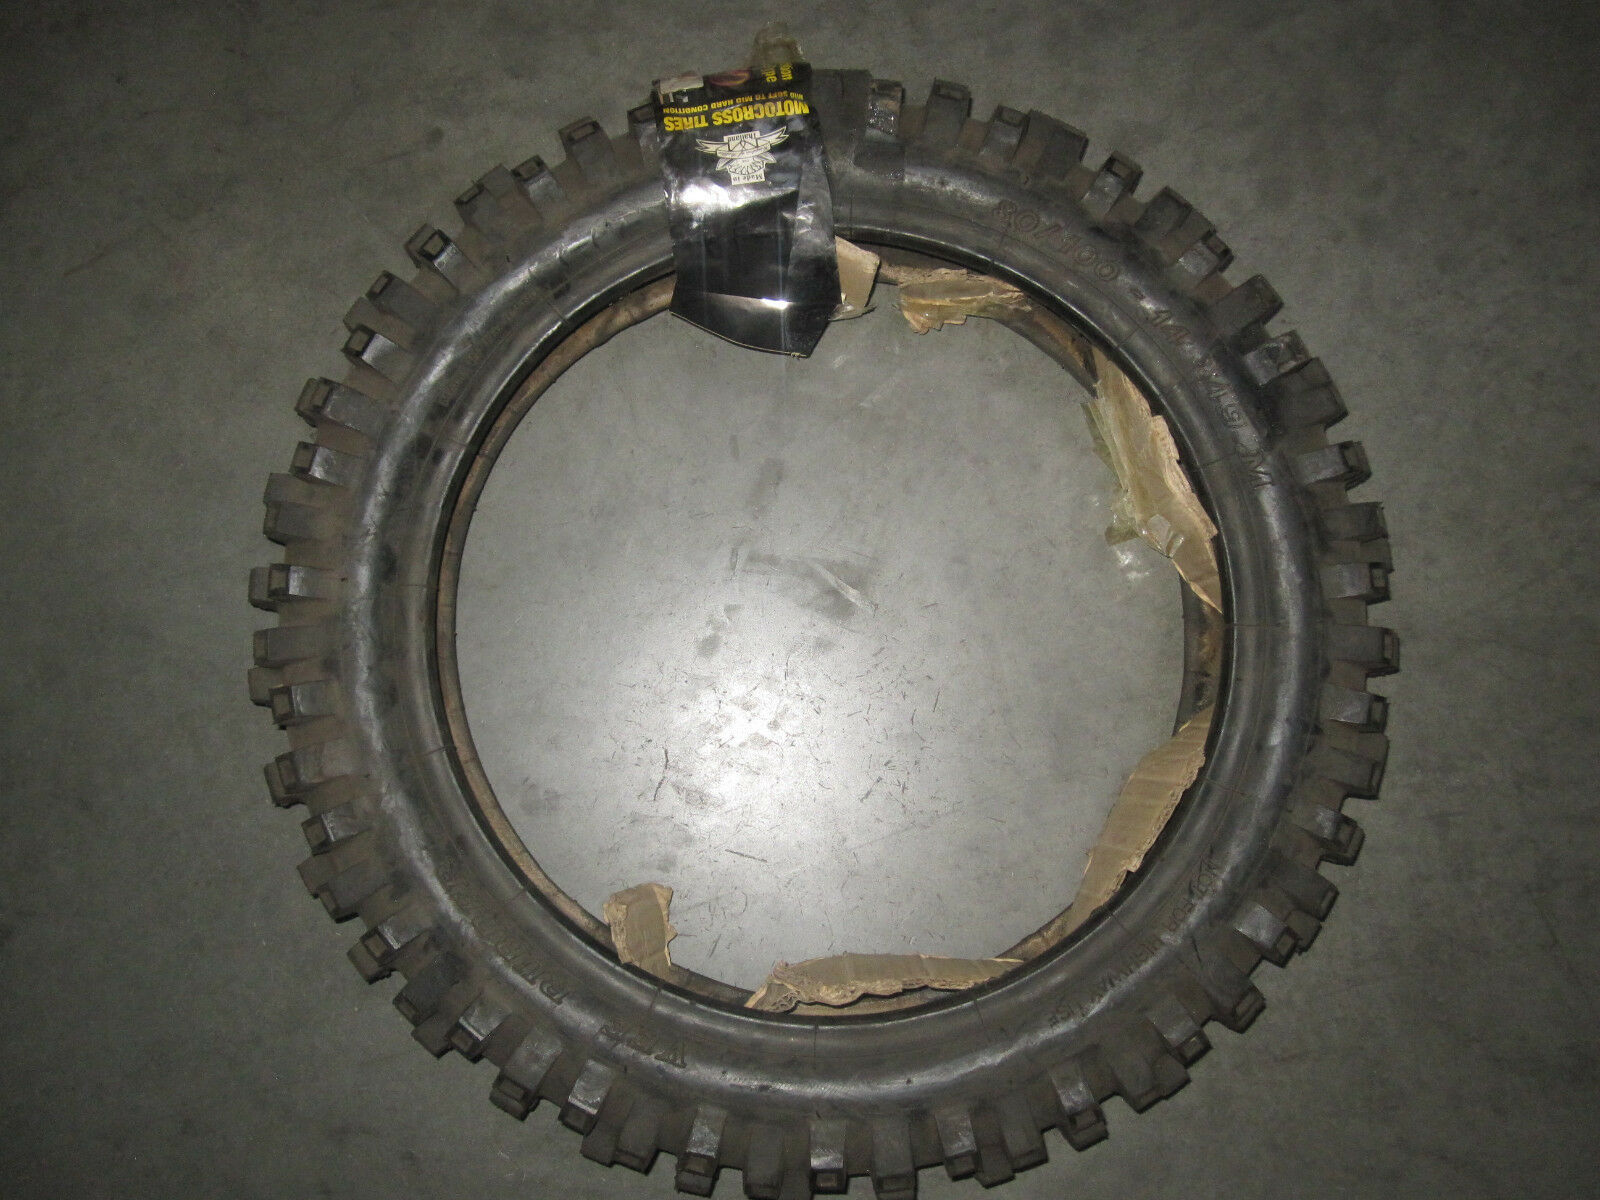 VEE RUBBER REAR TIRE TUBE 80/100-14 49M SUZUKI RM80 RM85 DRZ125